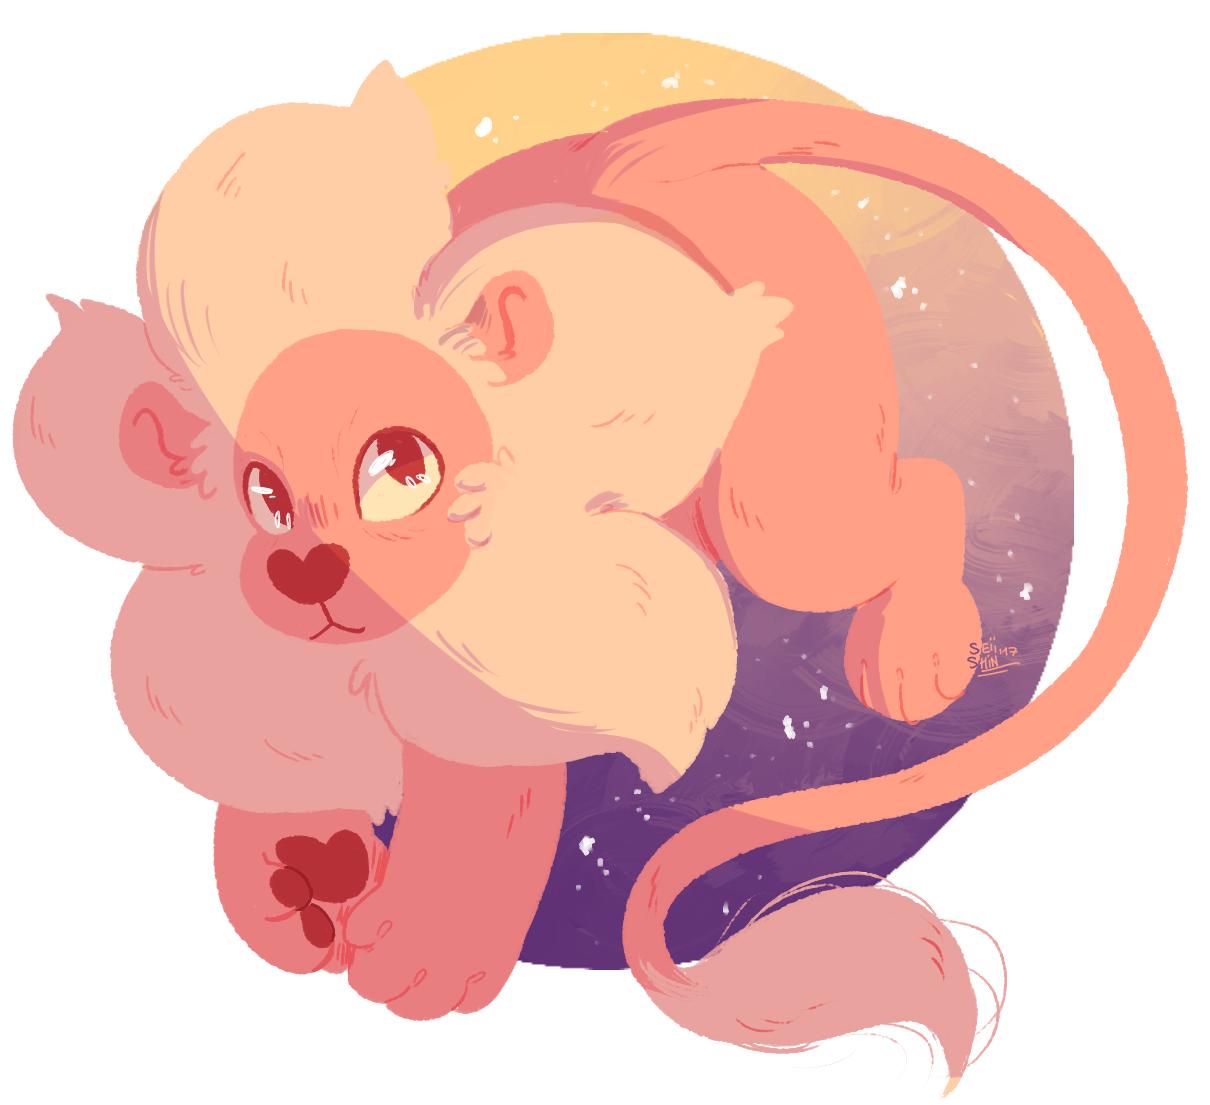 i actually kinda felt like drawing lion actually